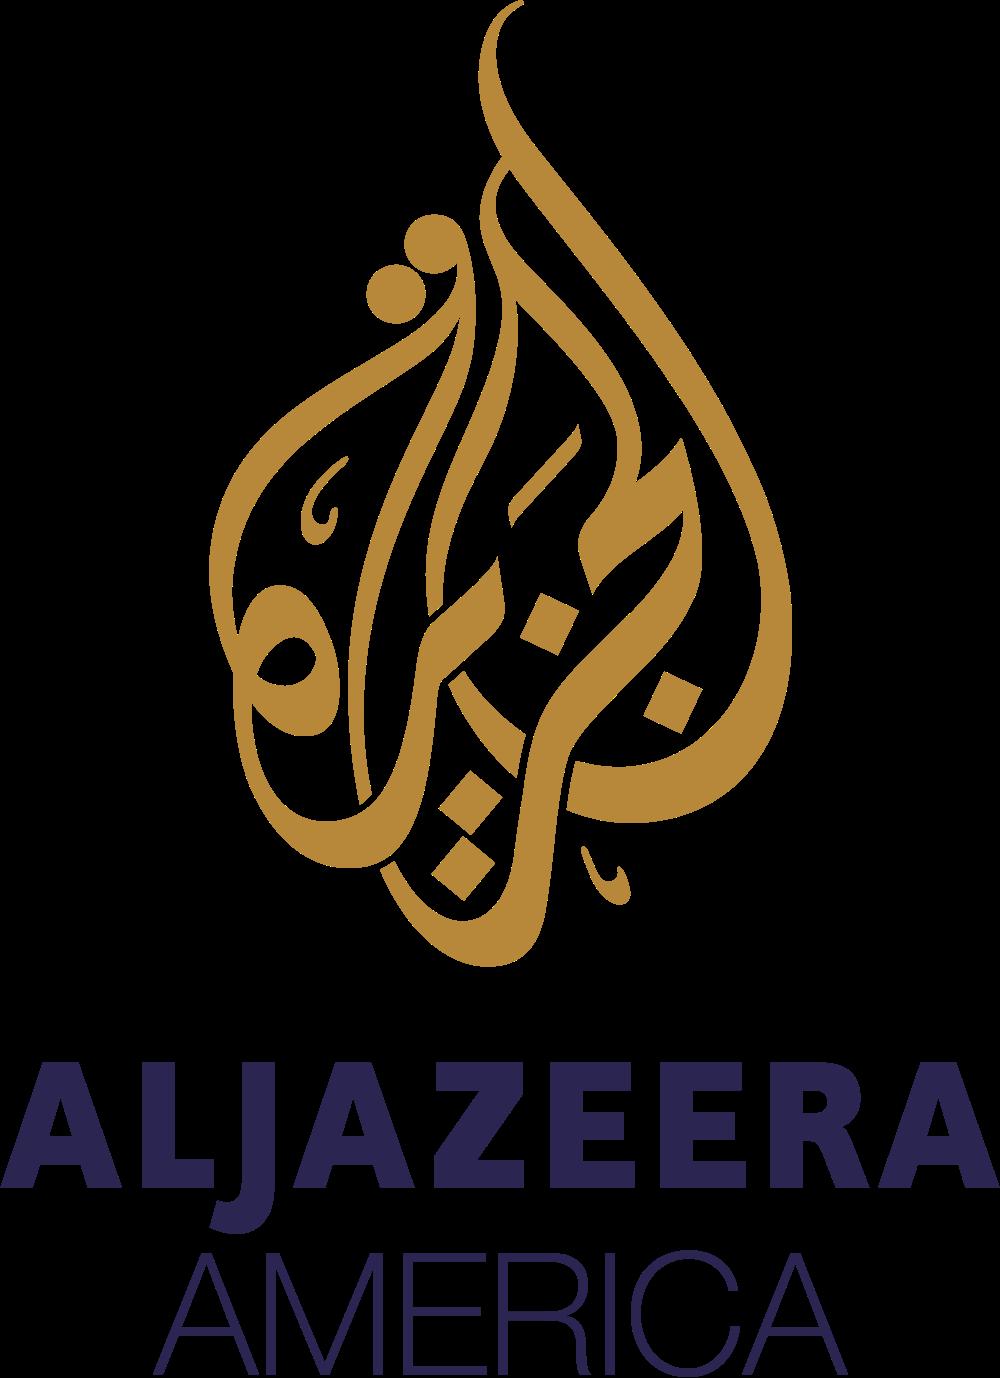 Al_Jazeera_America_Logo.png